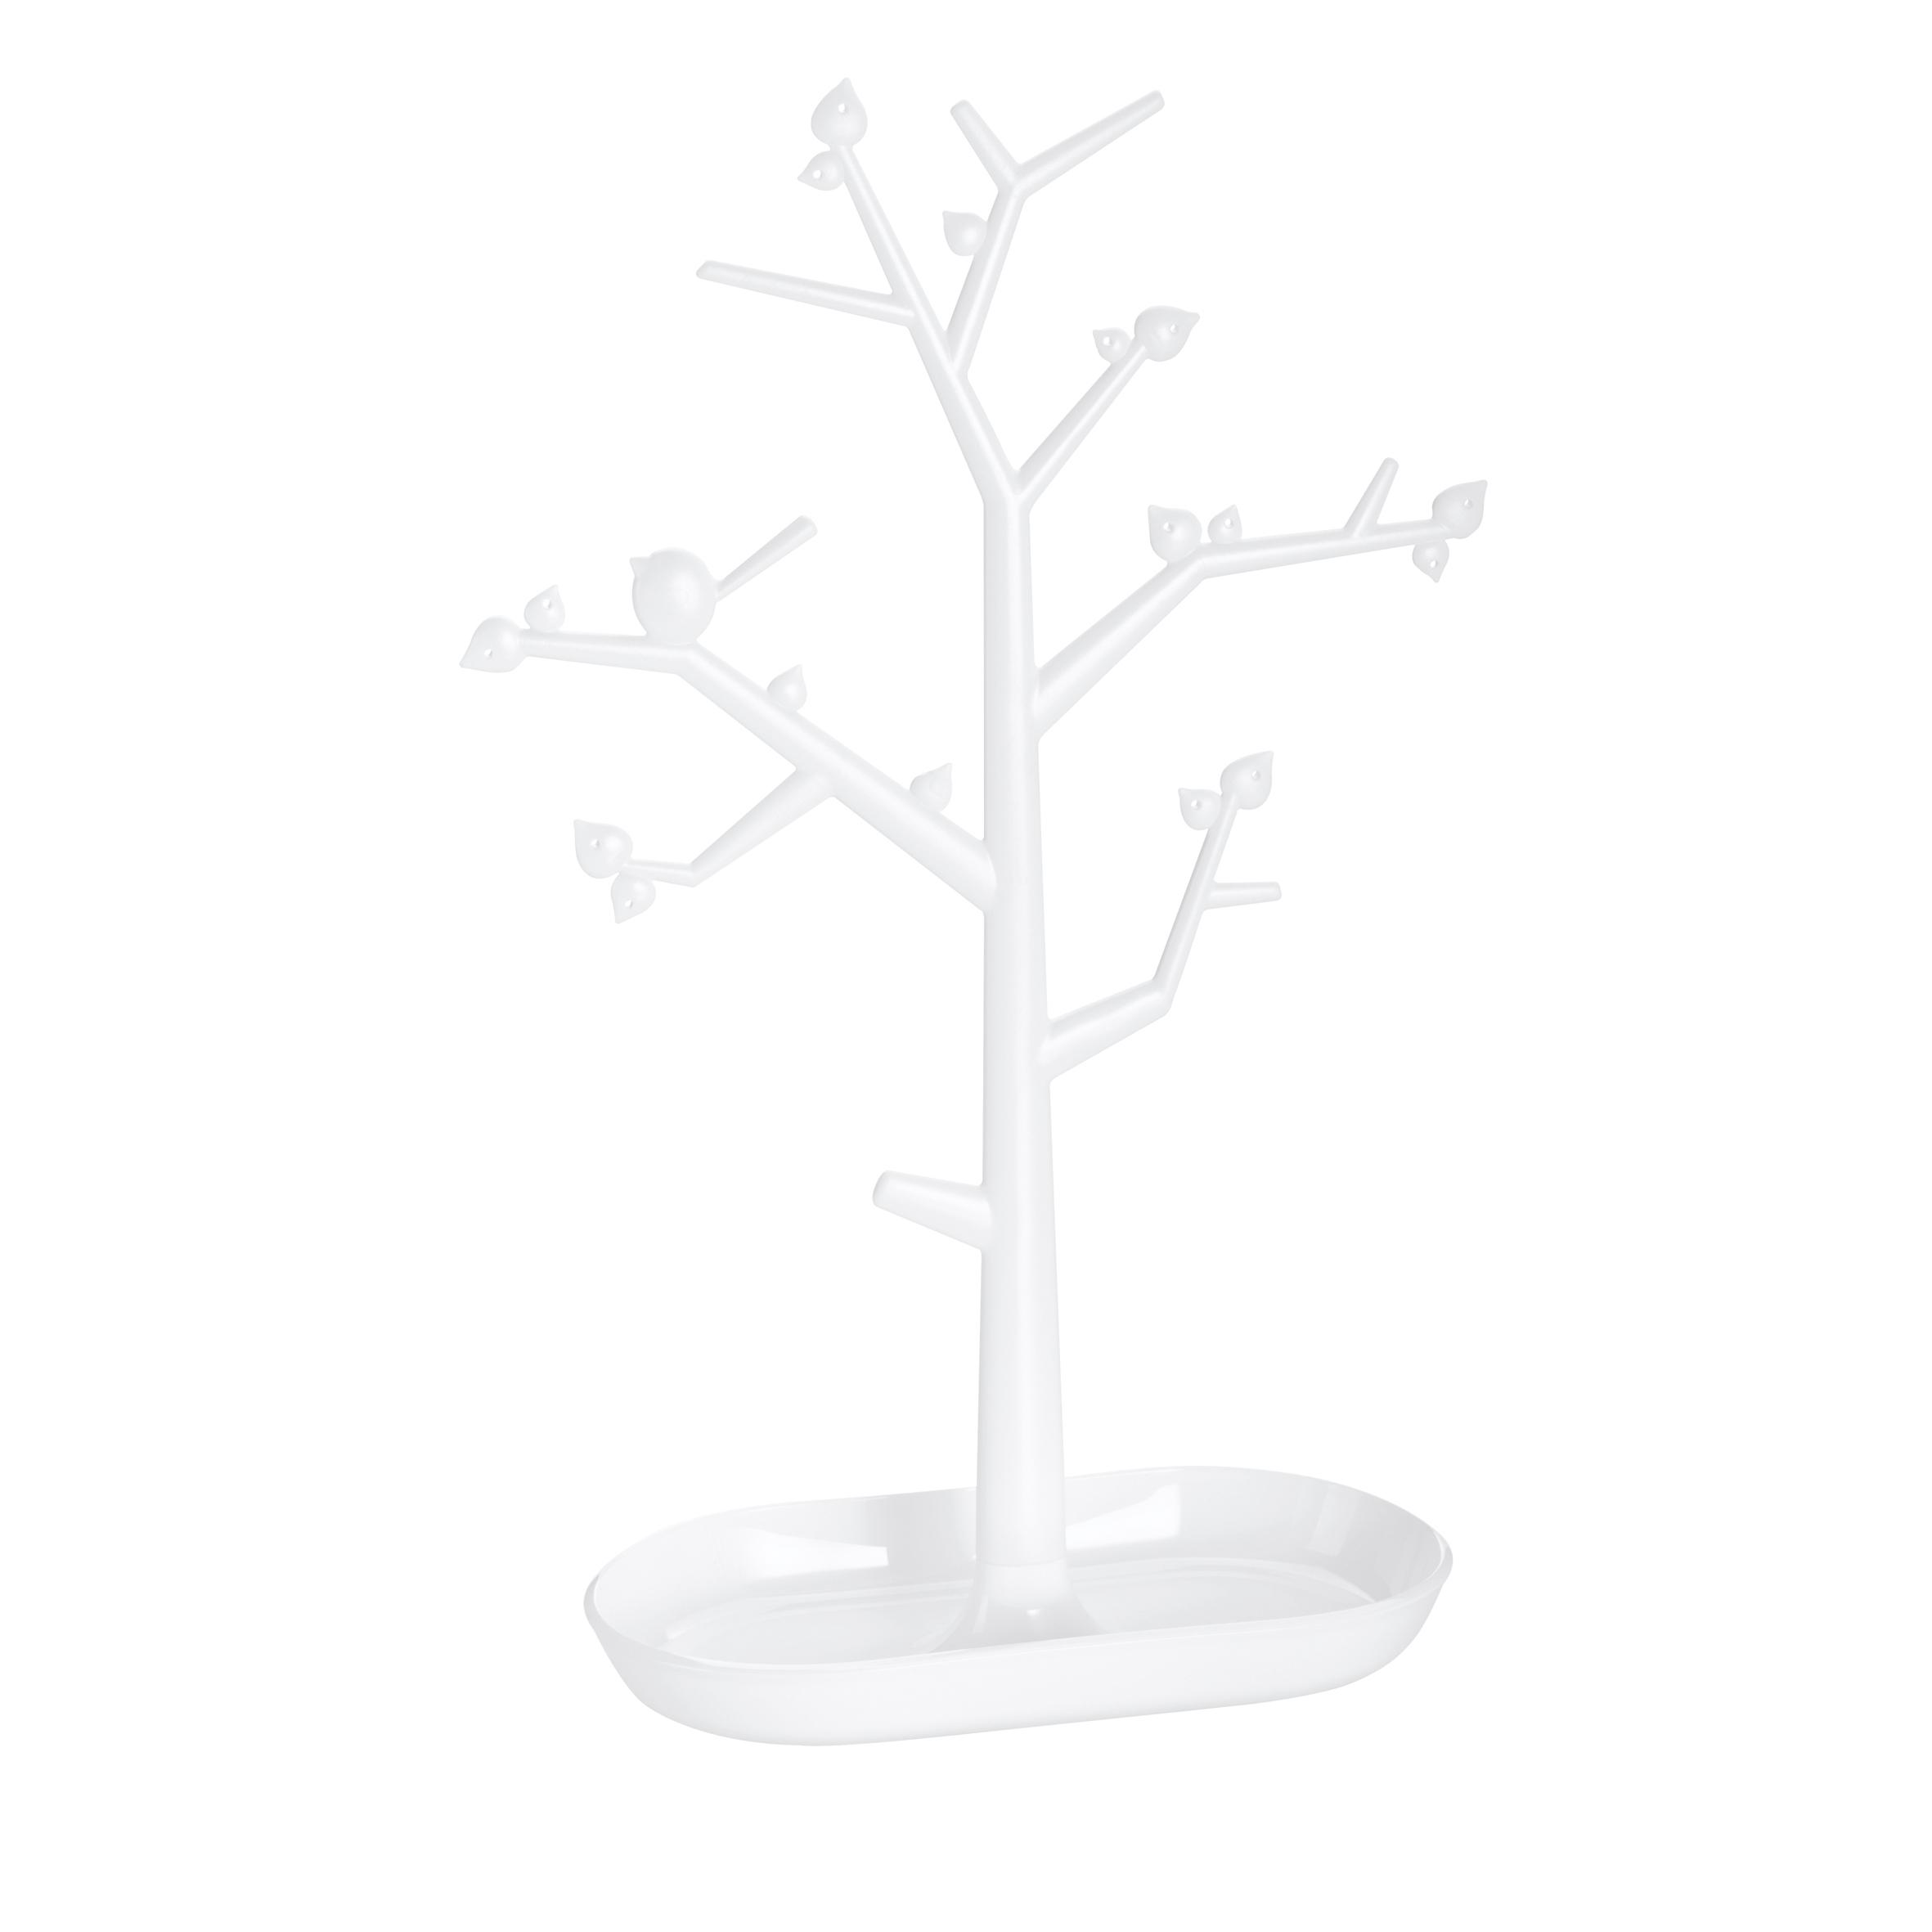 Suport pentru bijuterii din termoplastic Trinket Tree II Alb, l27,6xA12,8xH43,8 cm imagine